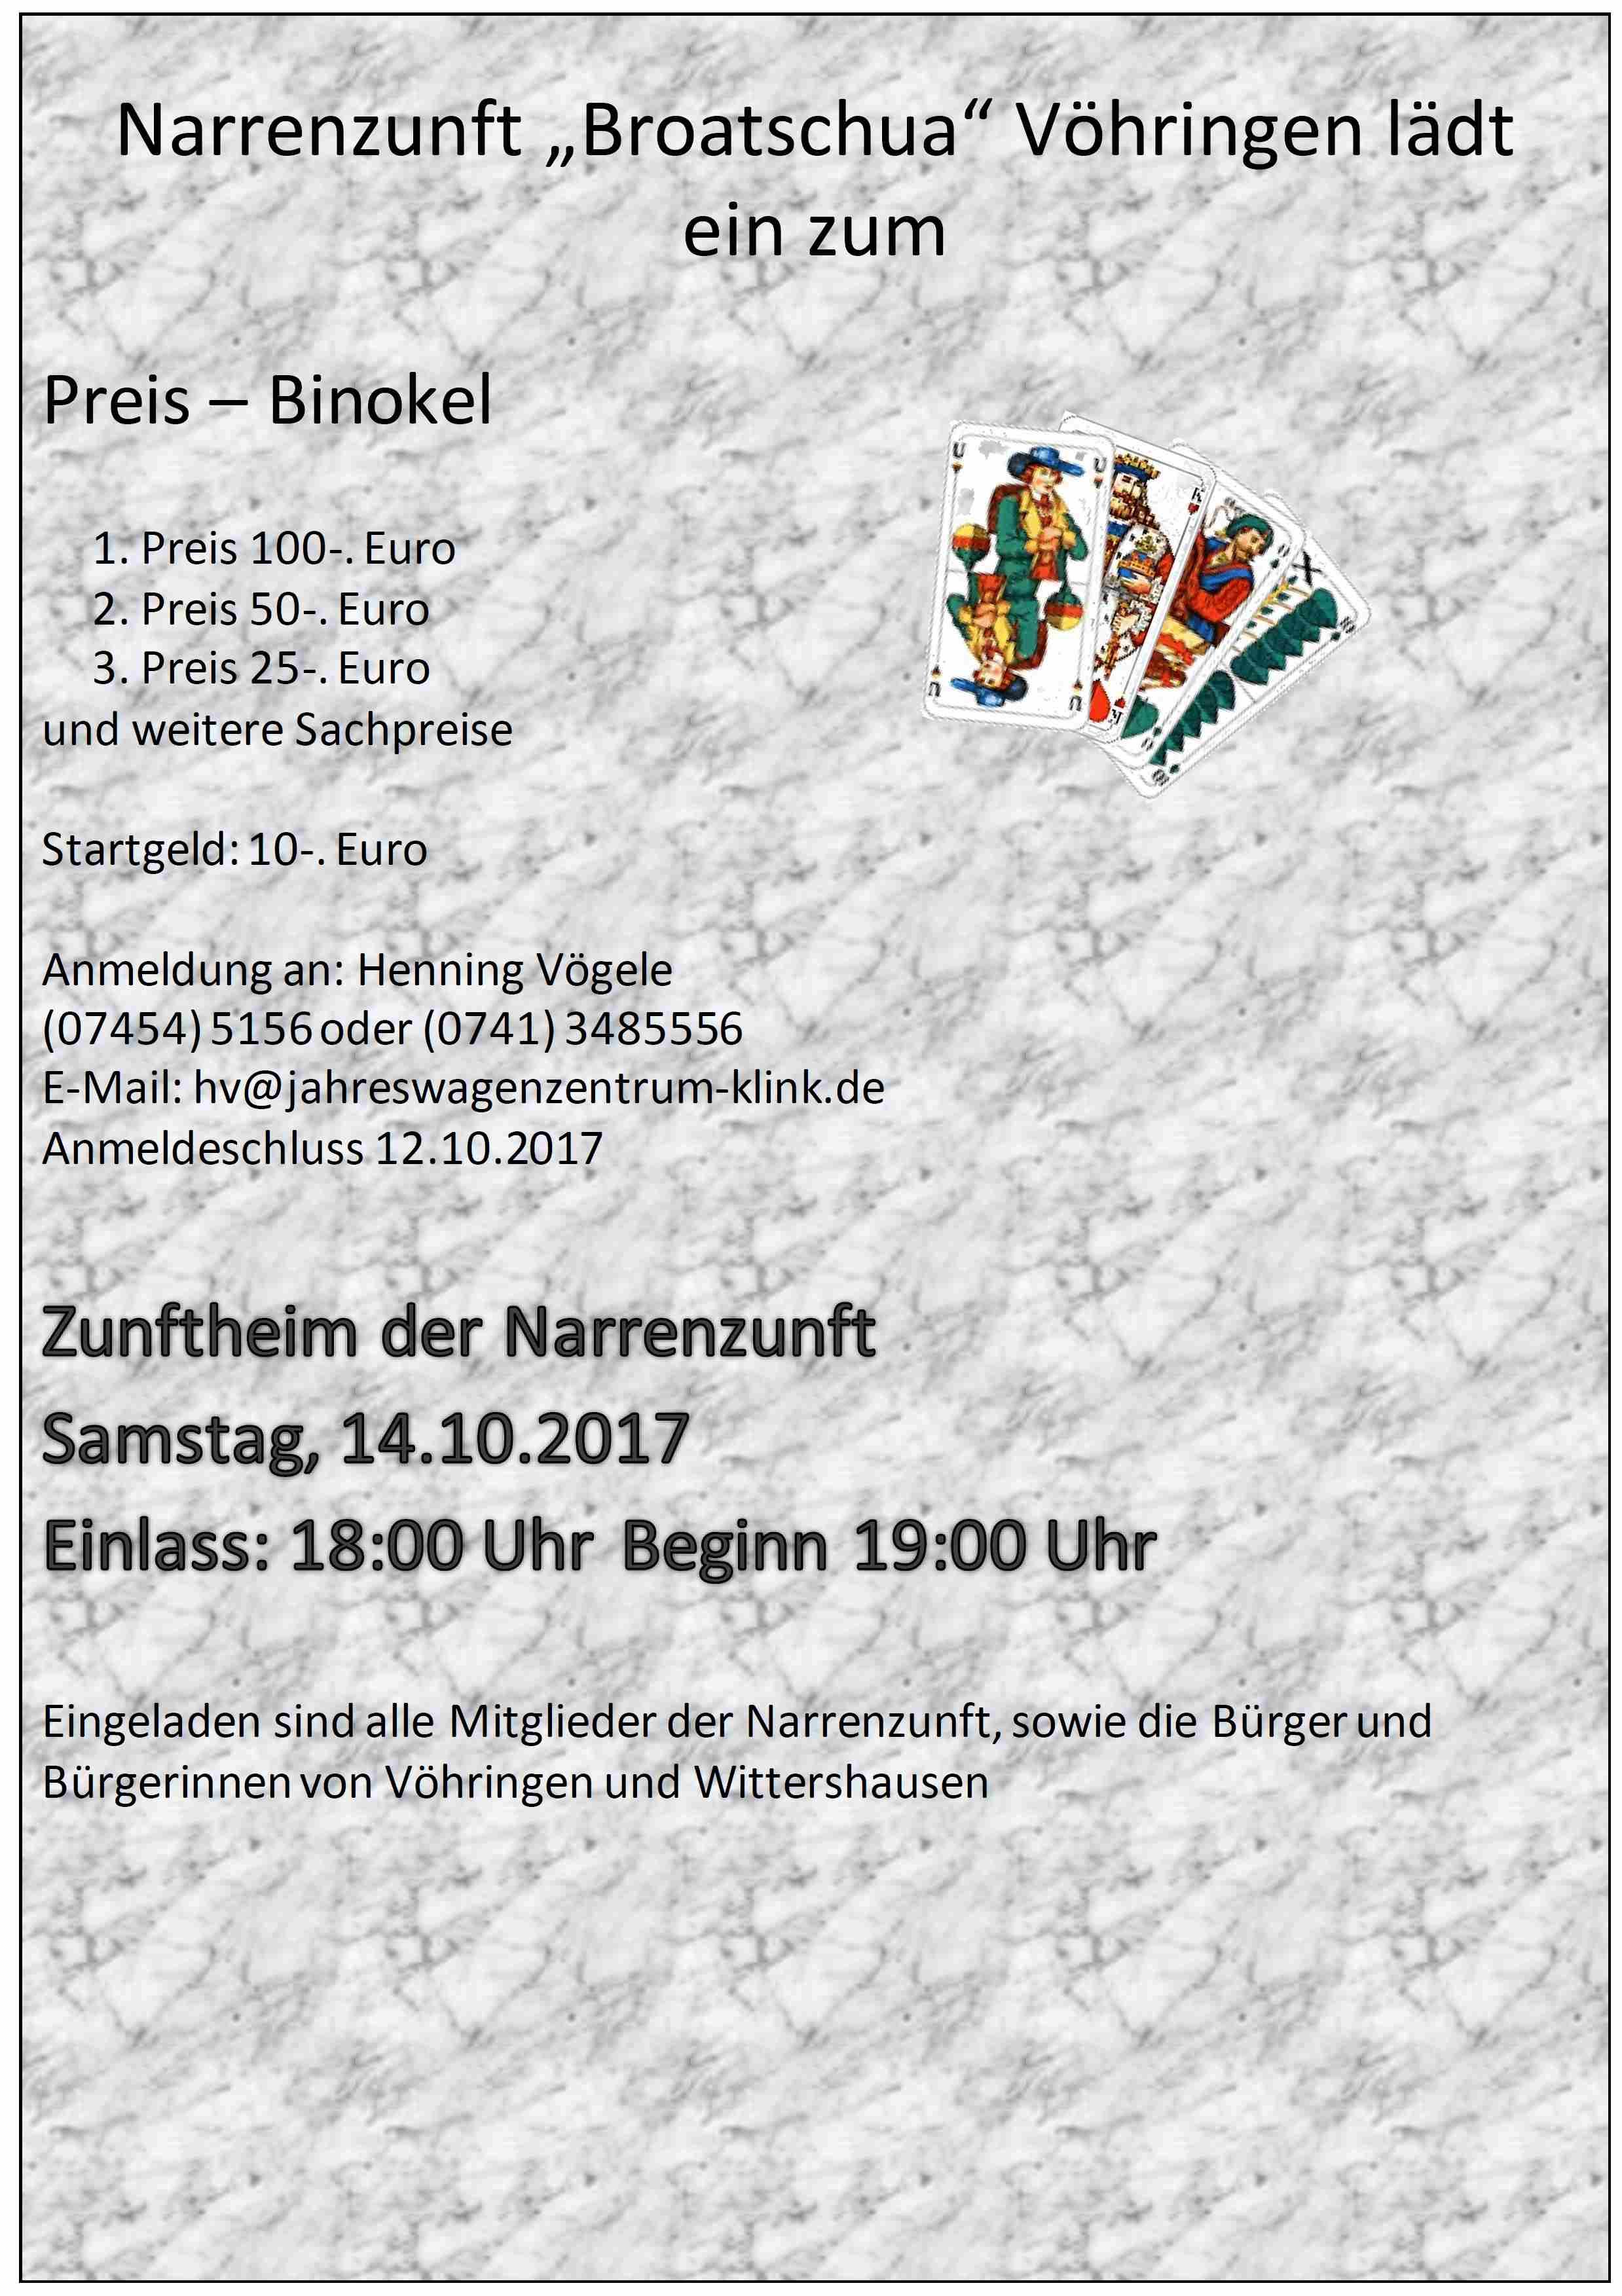 Preis - Binokel 2017